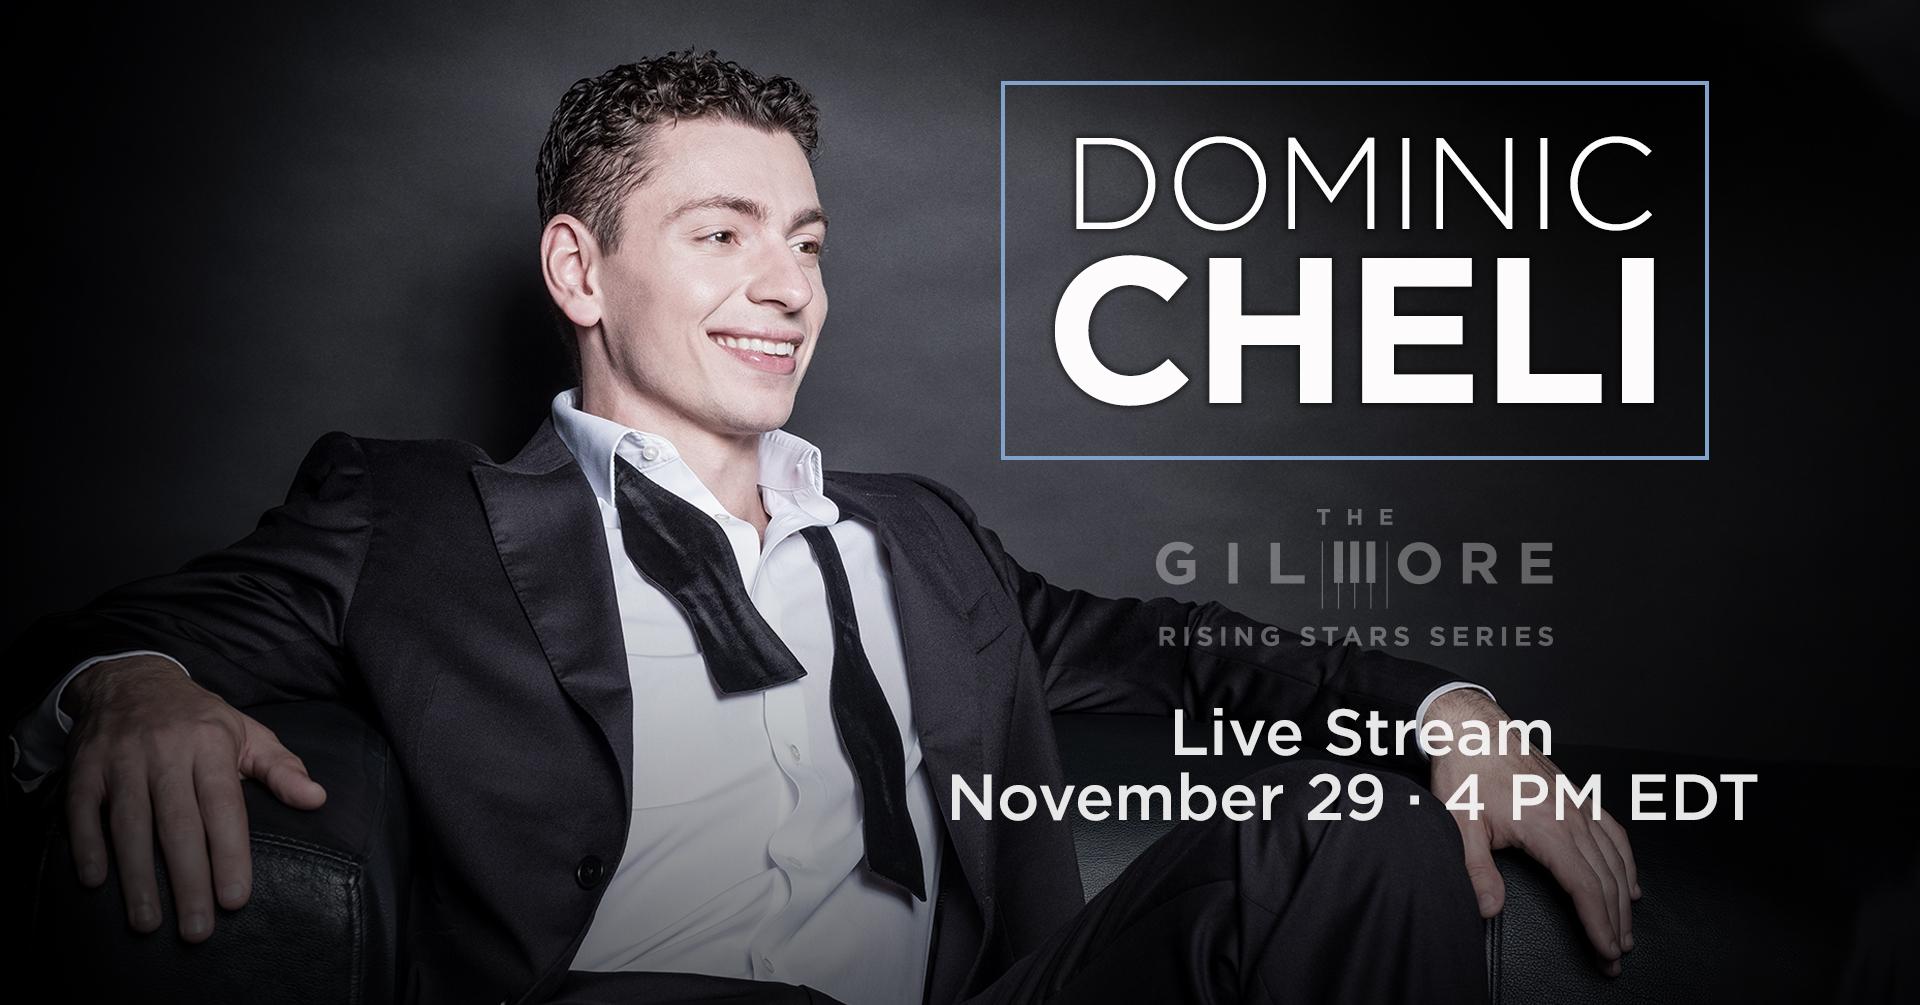 Dominic Cheli | Rising Stars Live Stream Event